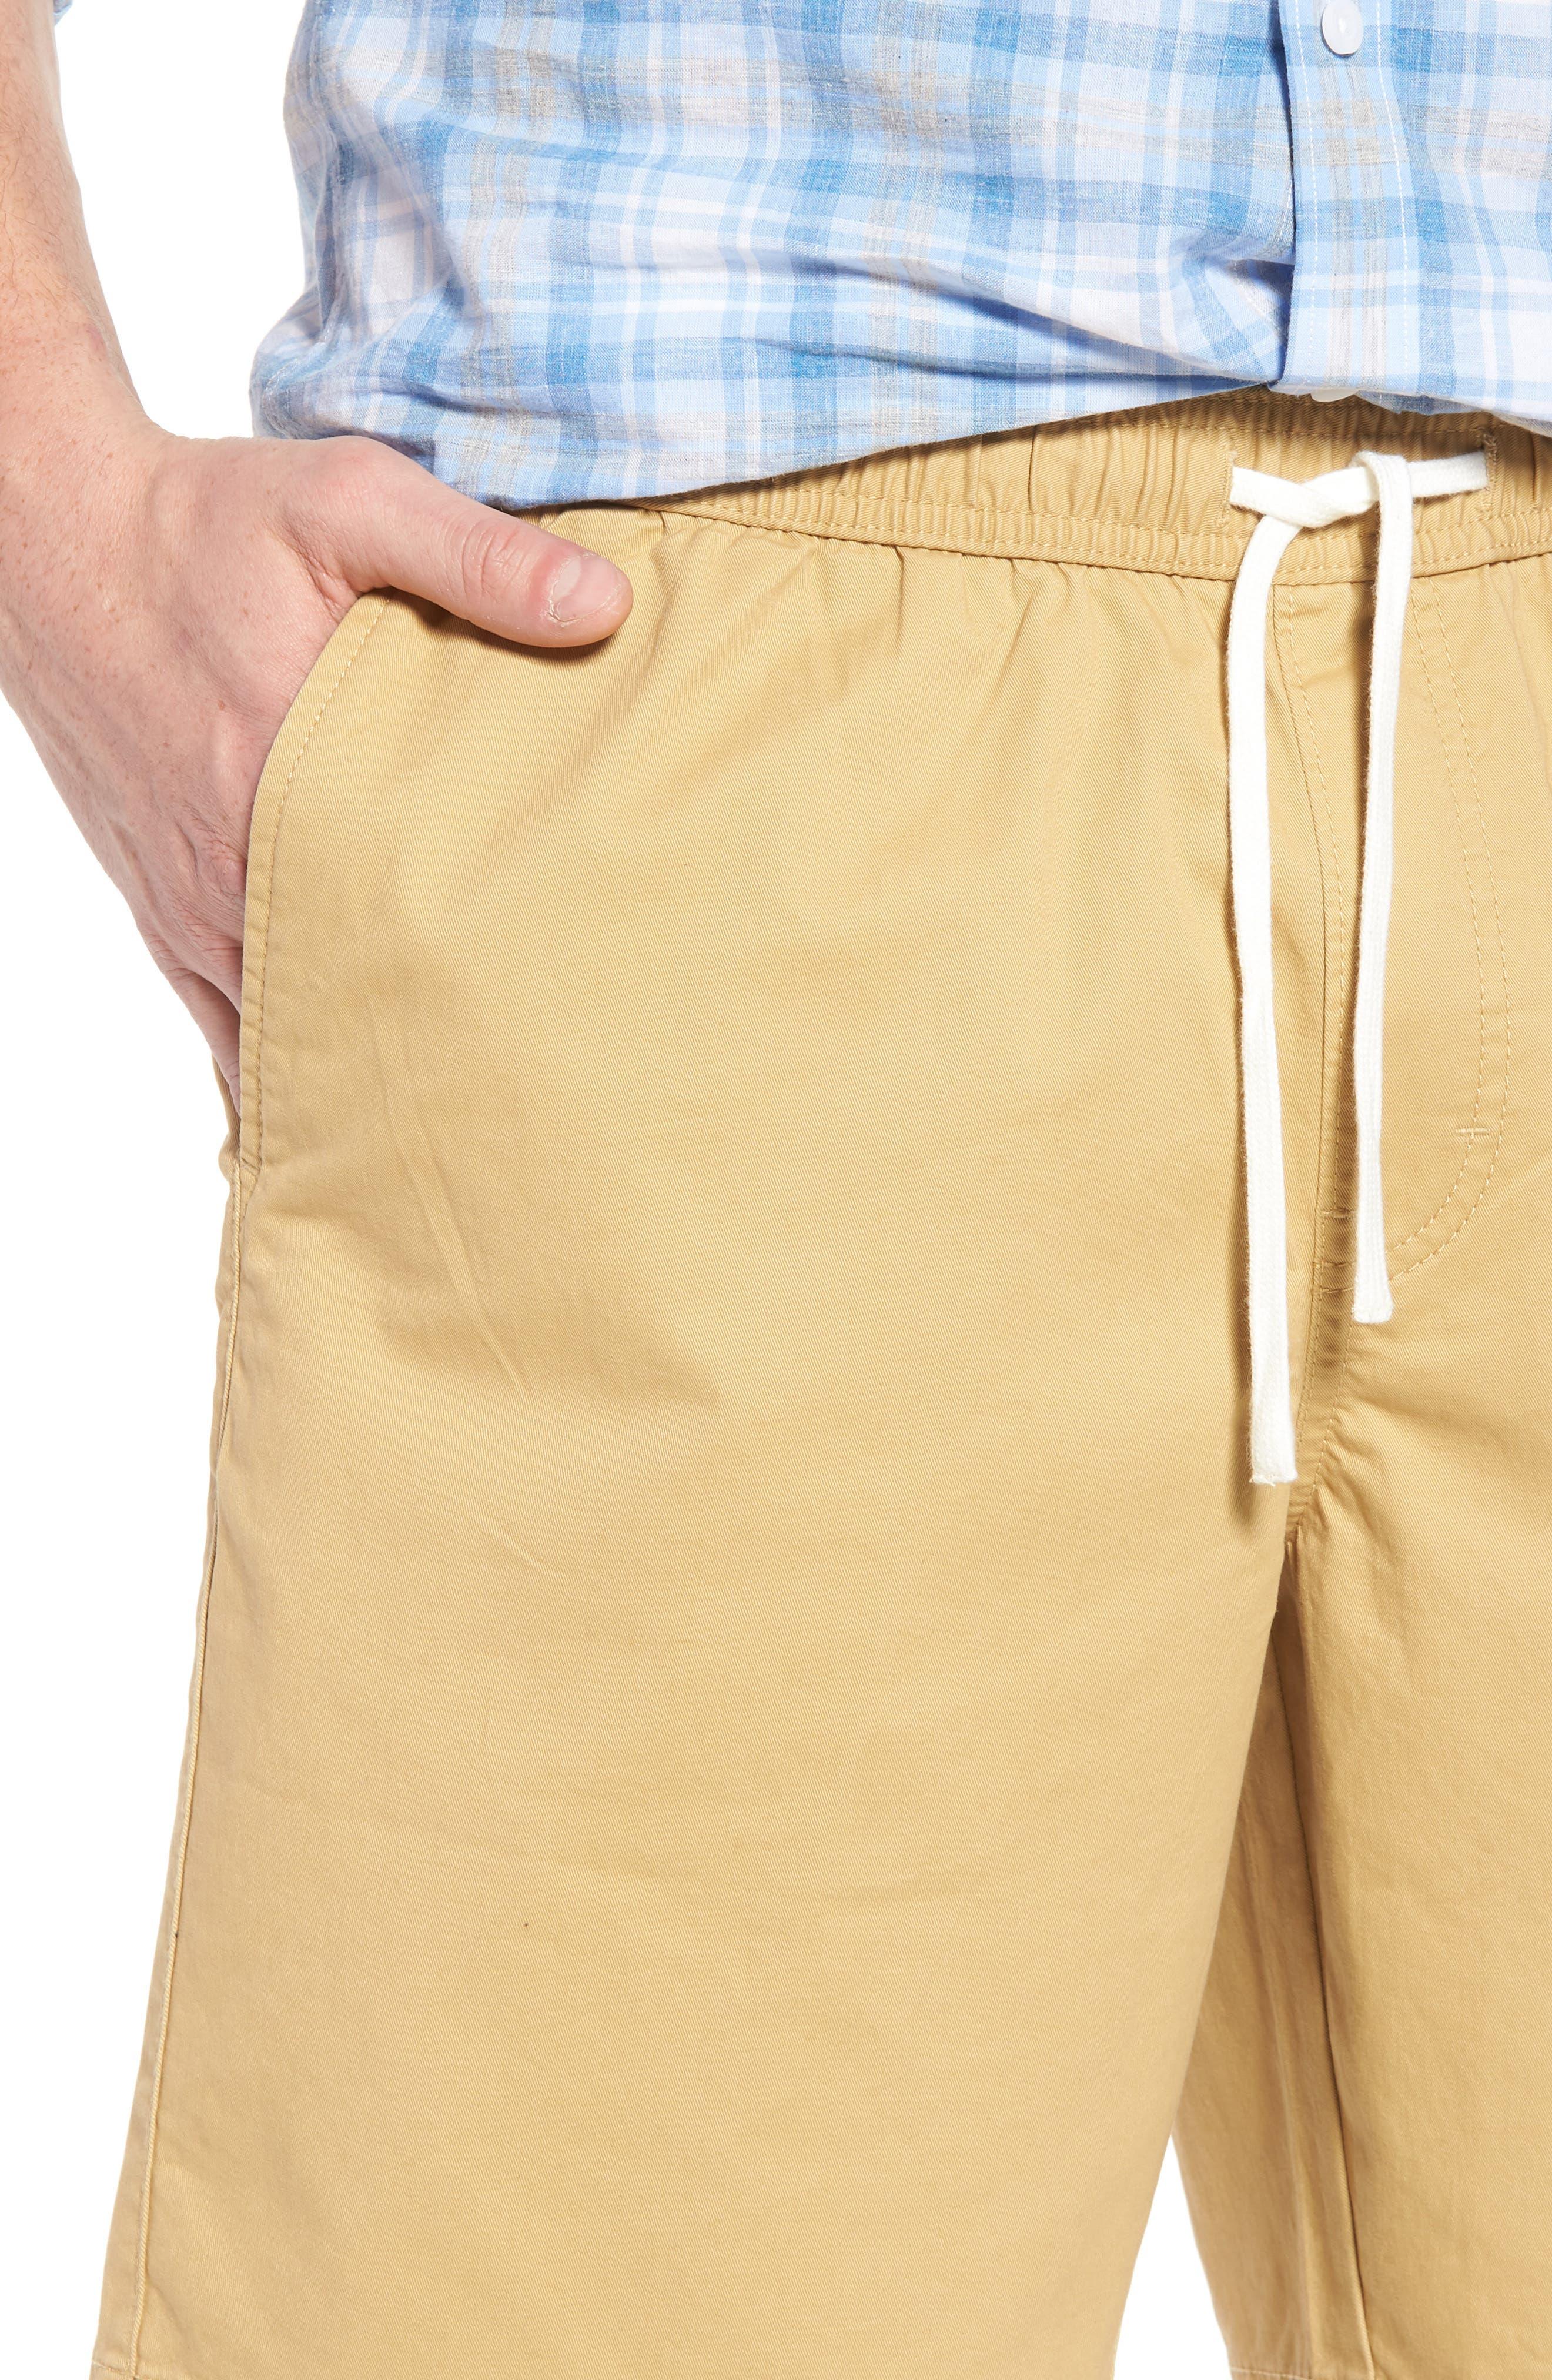 Ballard Slim Fit Shorts,                             Alternate thumbnail 4, color,                             Tan Lark